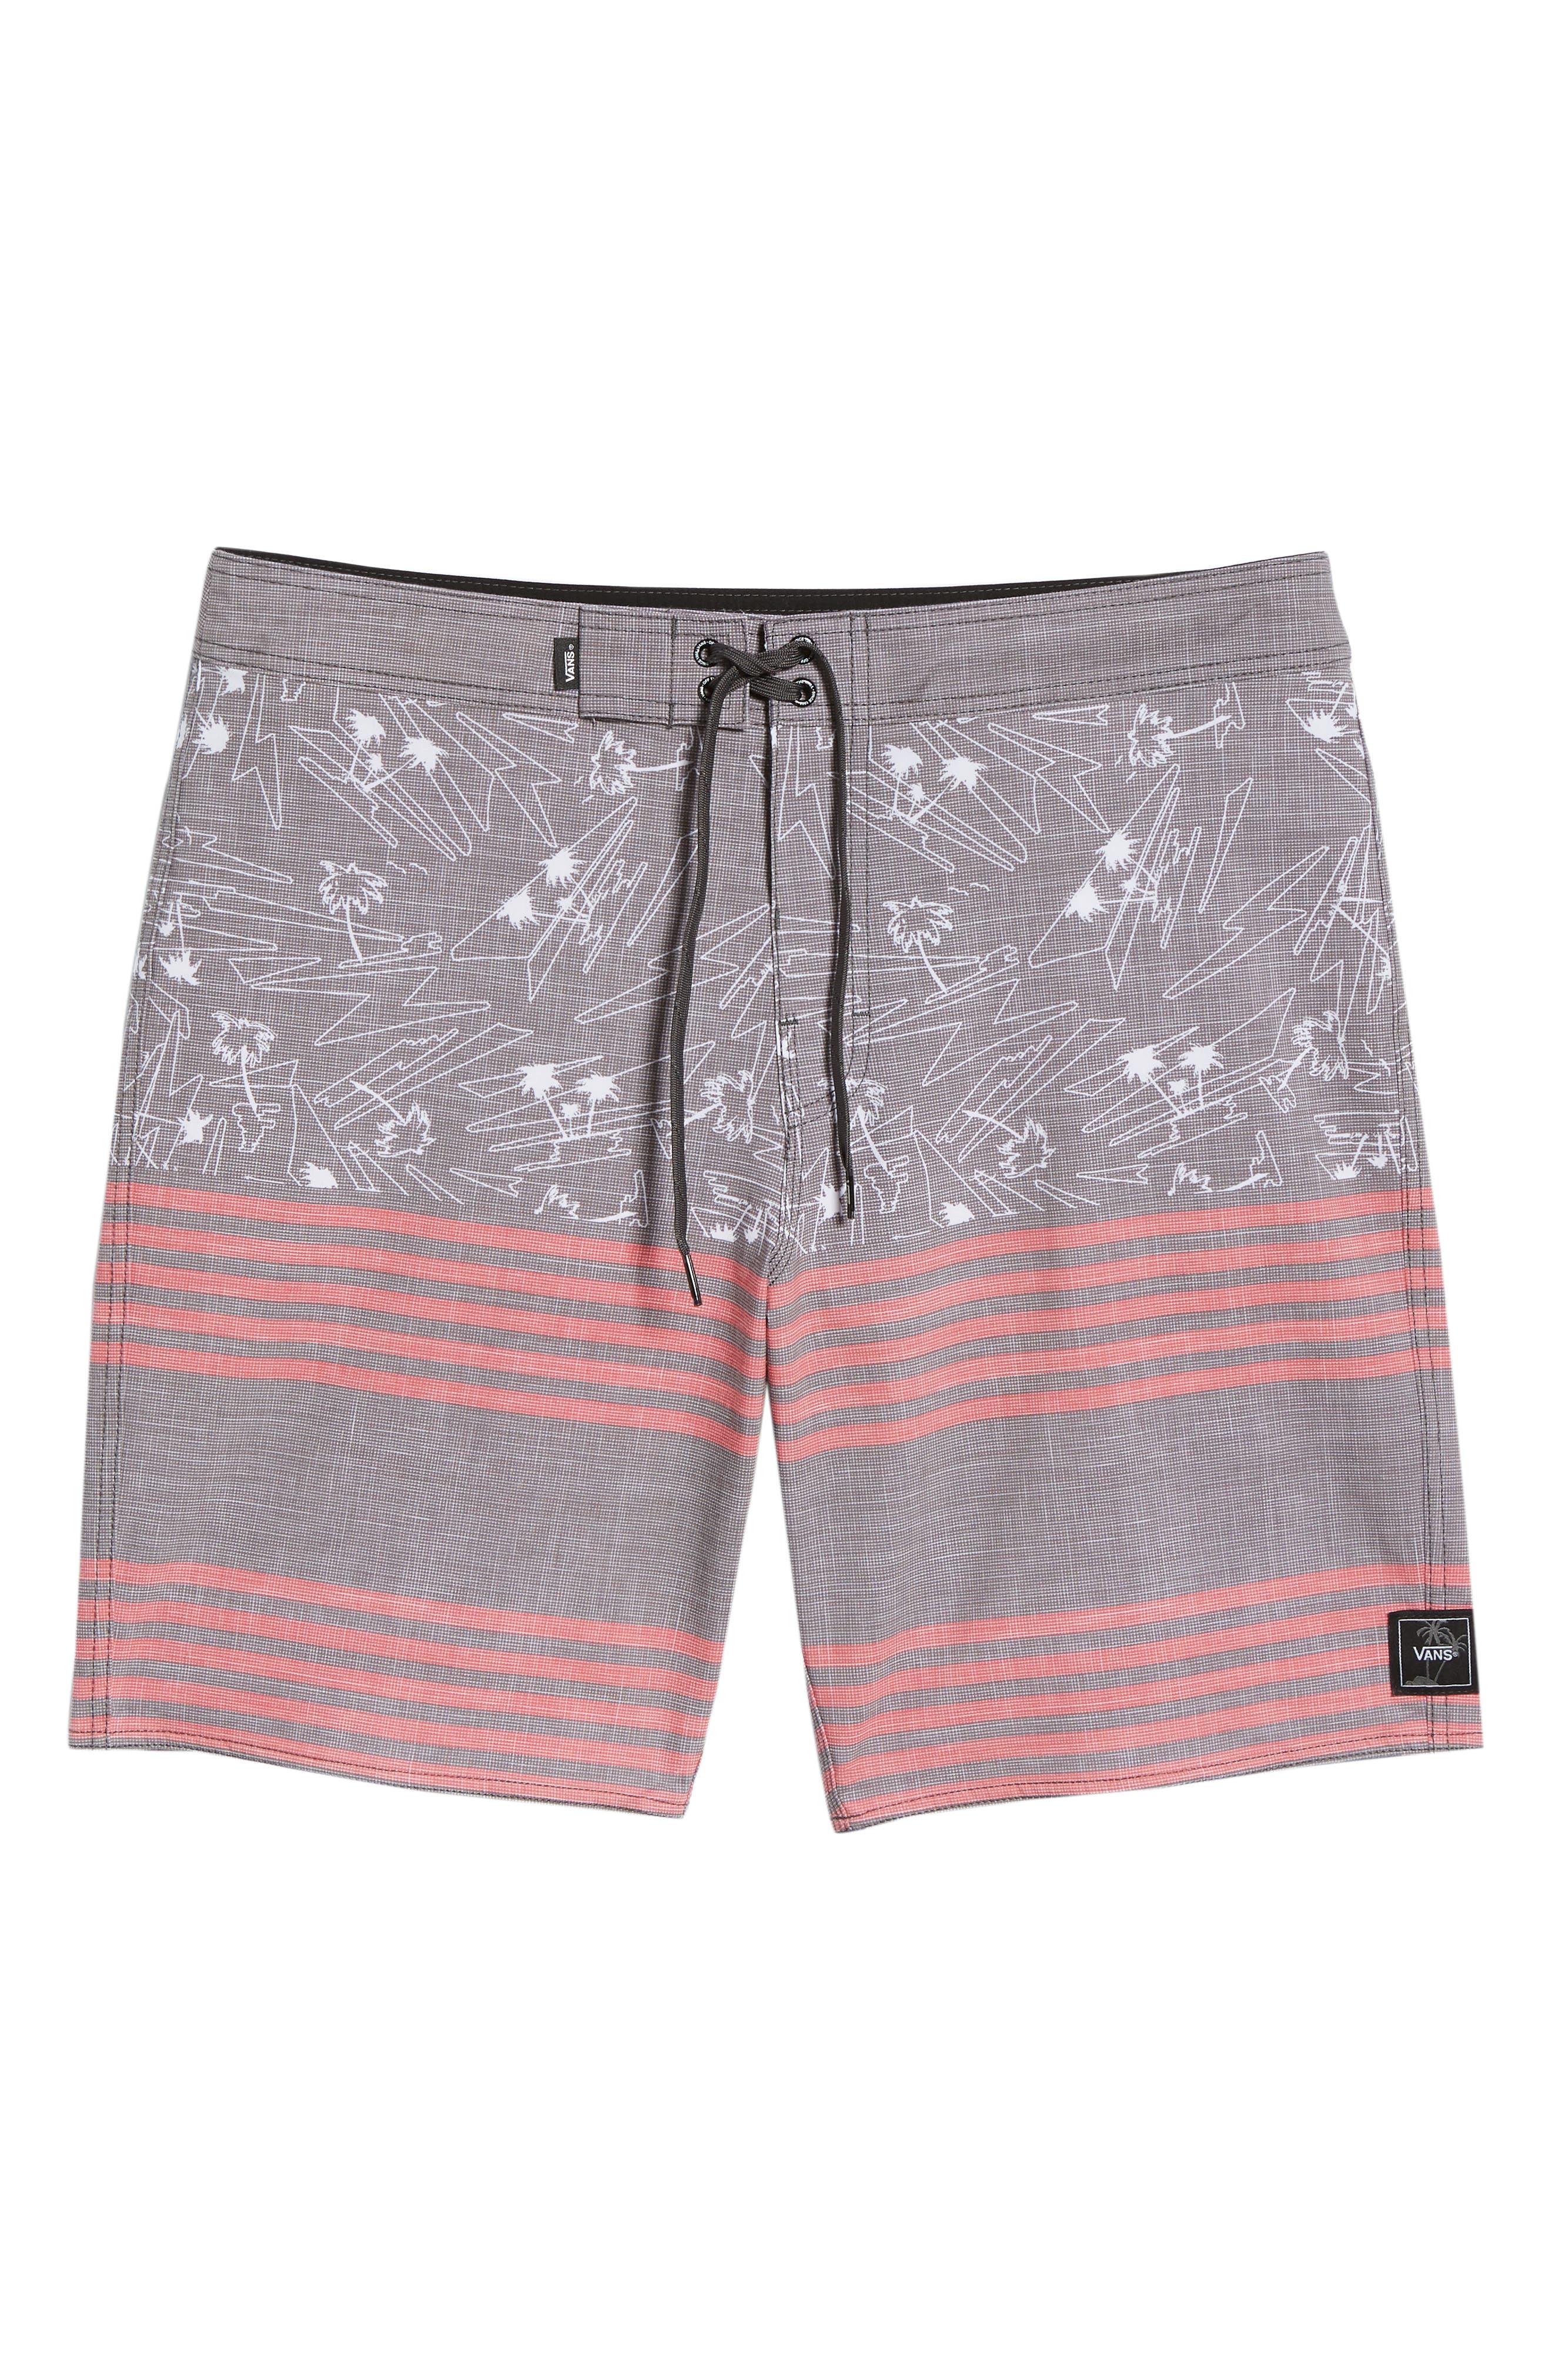 Era Board Shorts,                             Alternate thumbnail 6, color,                             BLACK ISLAND BEACH